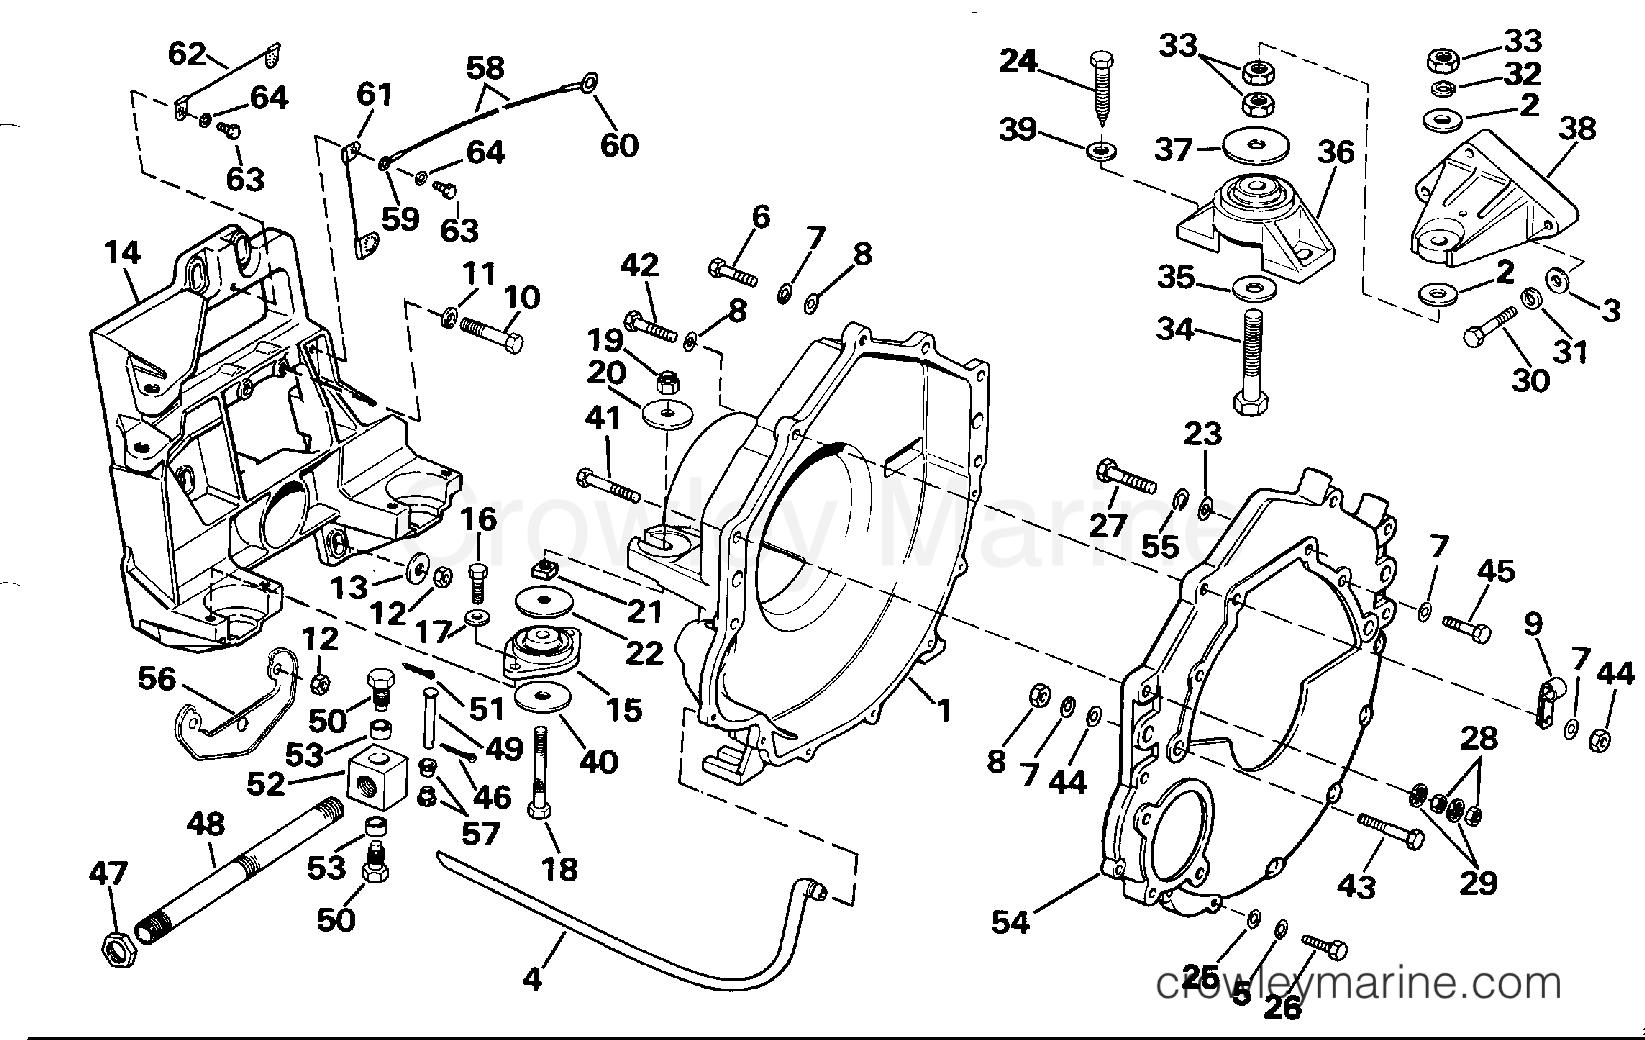 1990 OMC Stern Drive 2.3 - 232BMRPWS TRANSOM PLATE, FLYWHEEL HOUSING & MOUNTS section